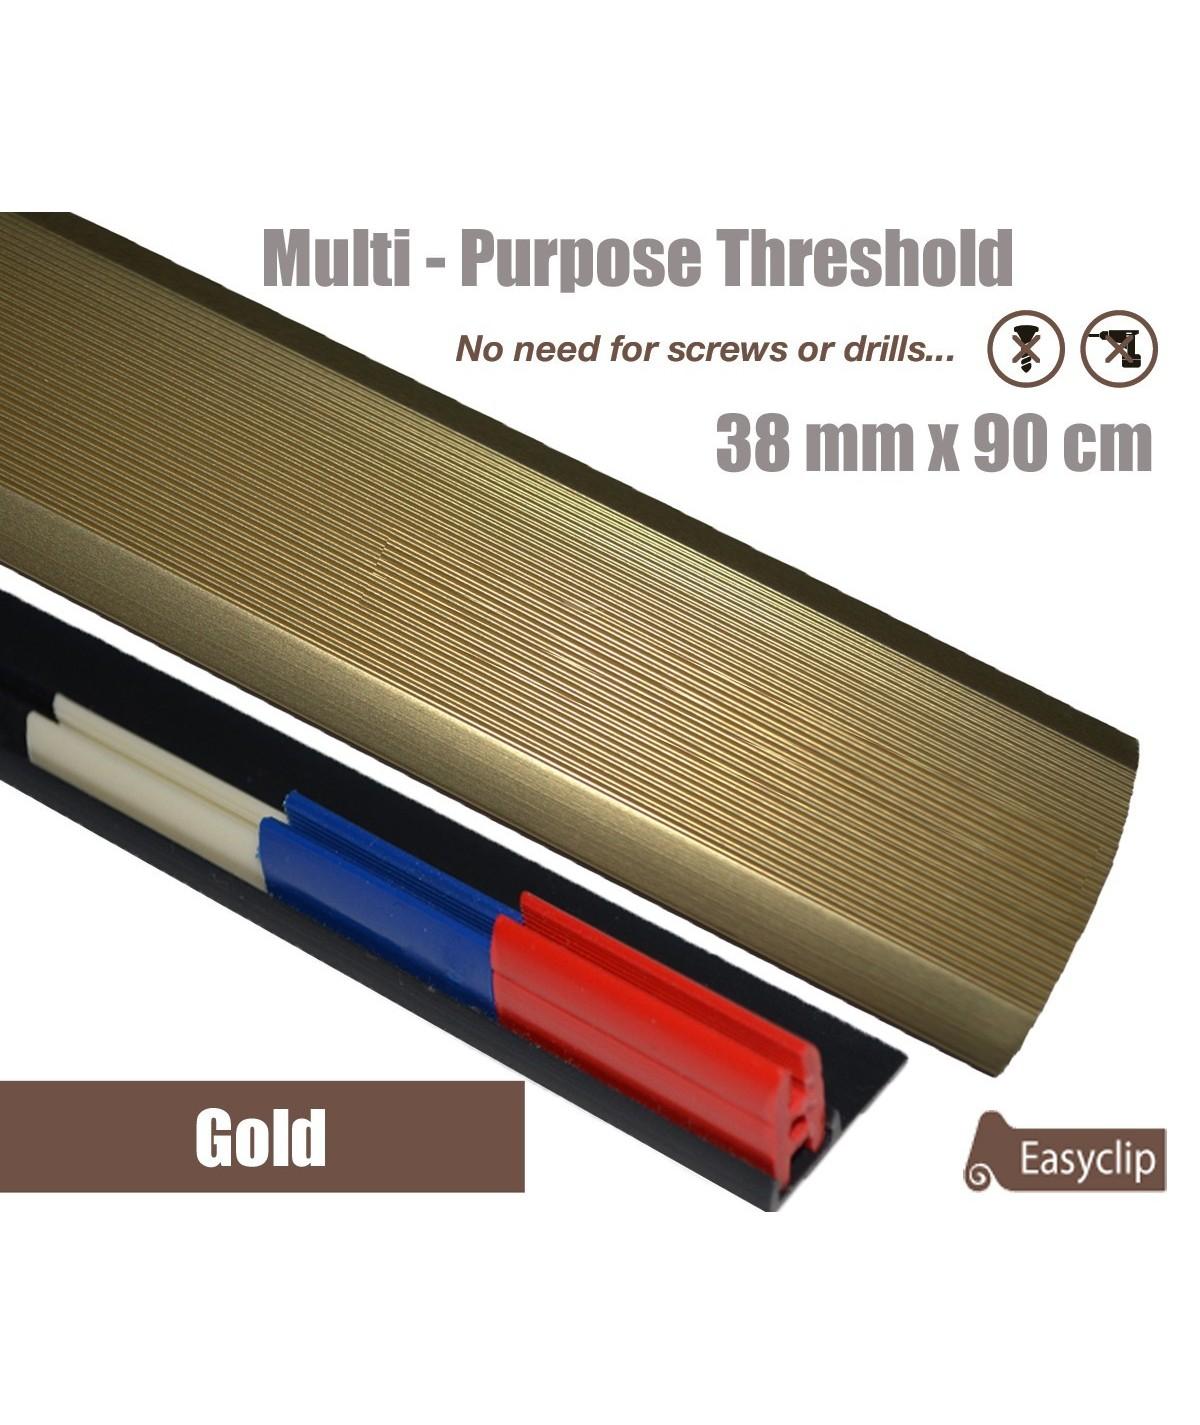 Gold 38mm x 90cm Aluminium Transition Threshold Strip Door Threshold Multi Purpose Easyclip Adhesive